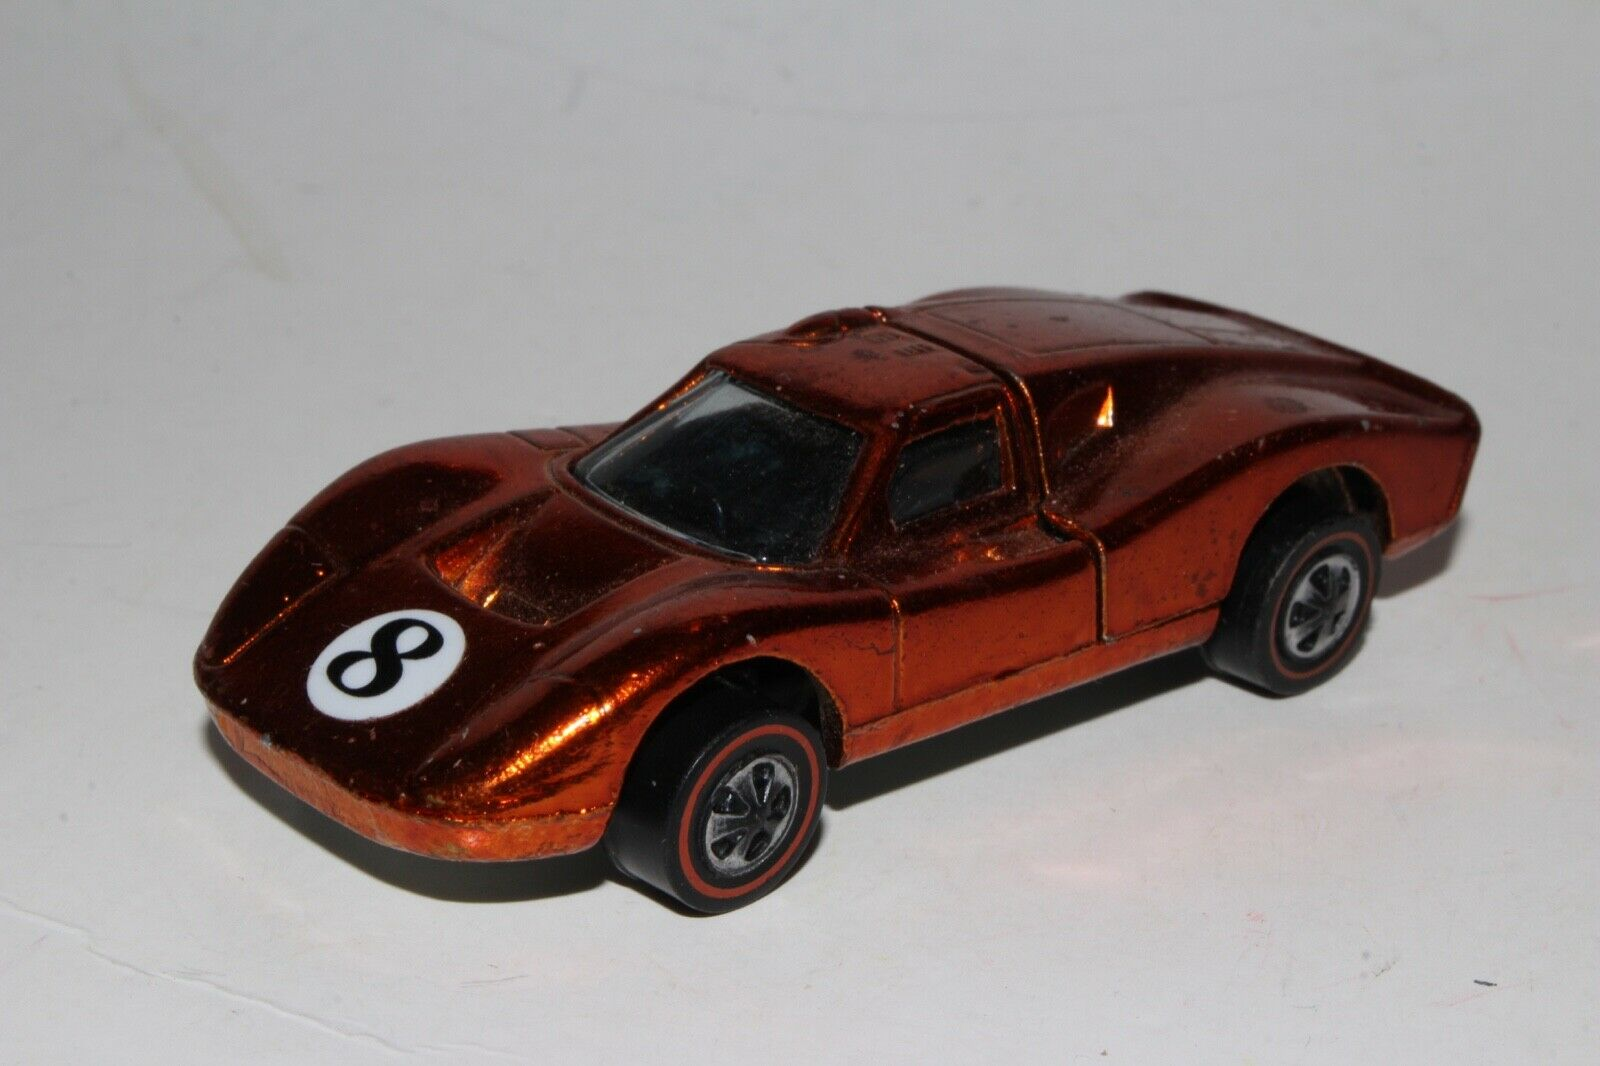 Hot Wheels rojoline Ford Mkiv ,Metálico Naranja, Eeuu ,Buen Estado, Original